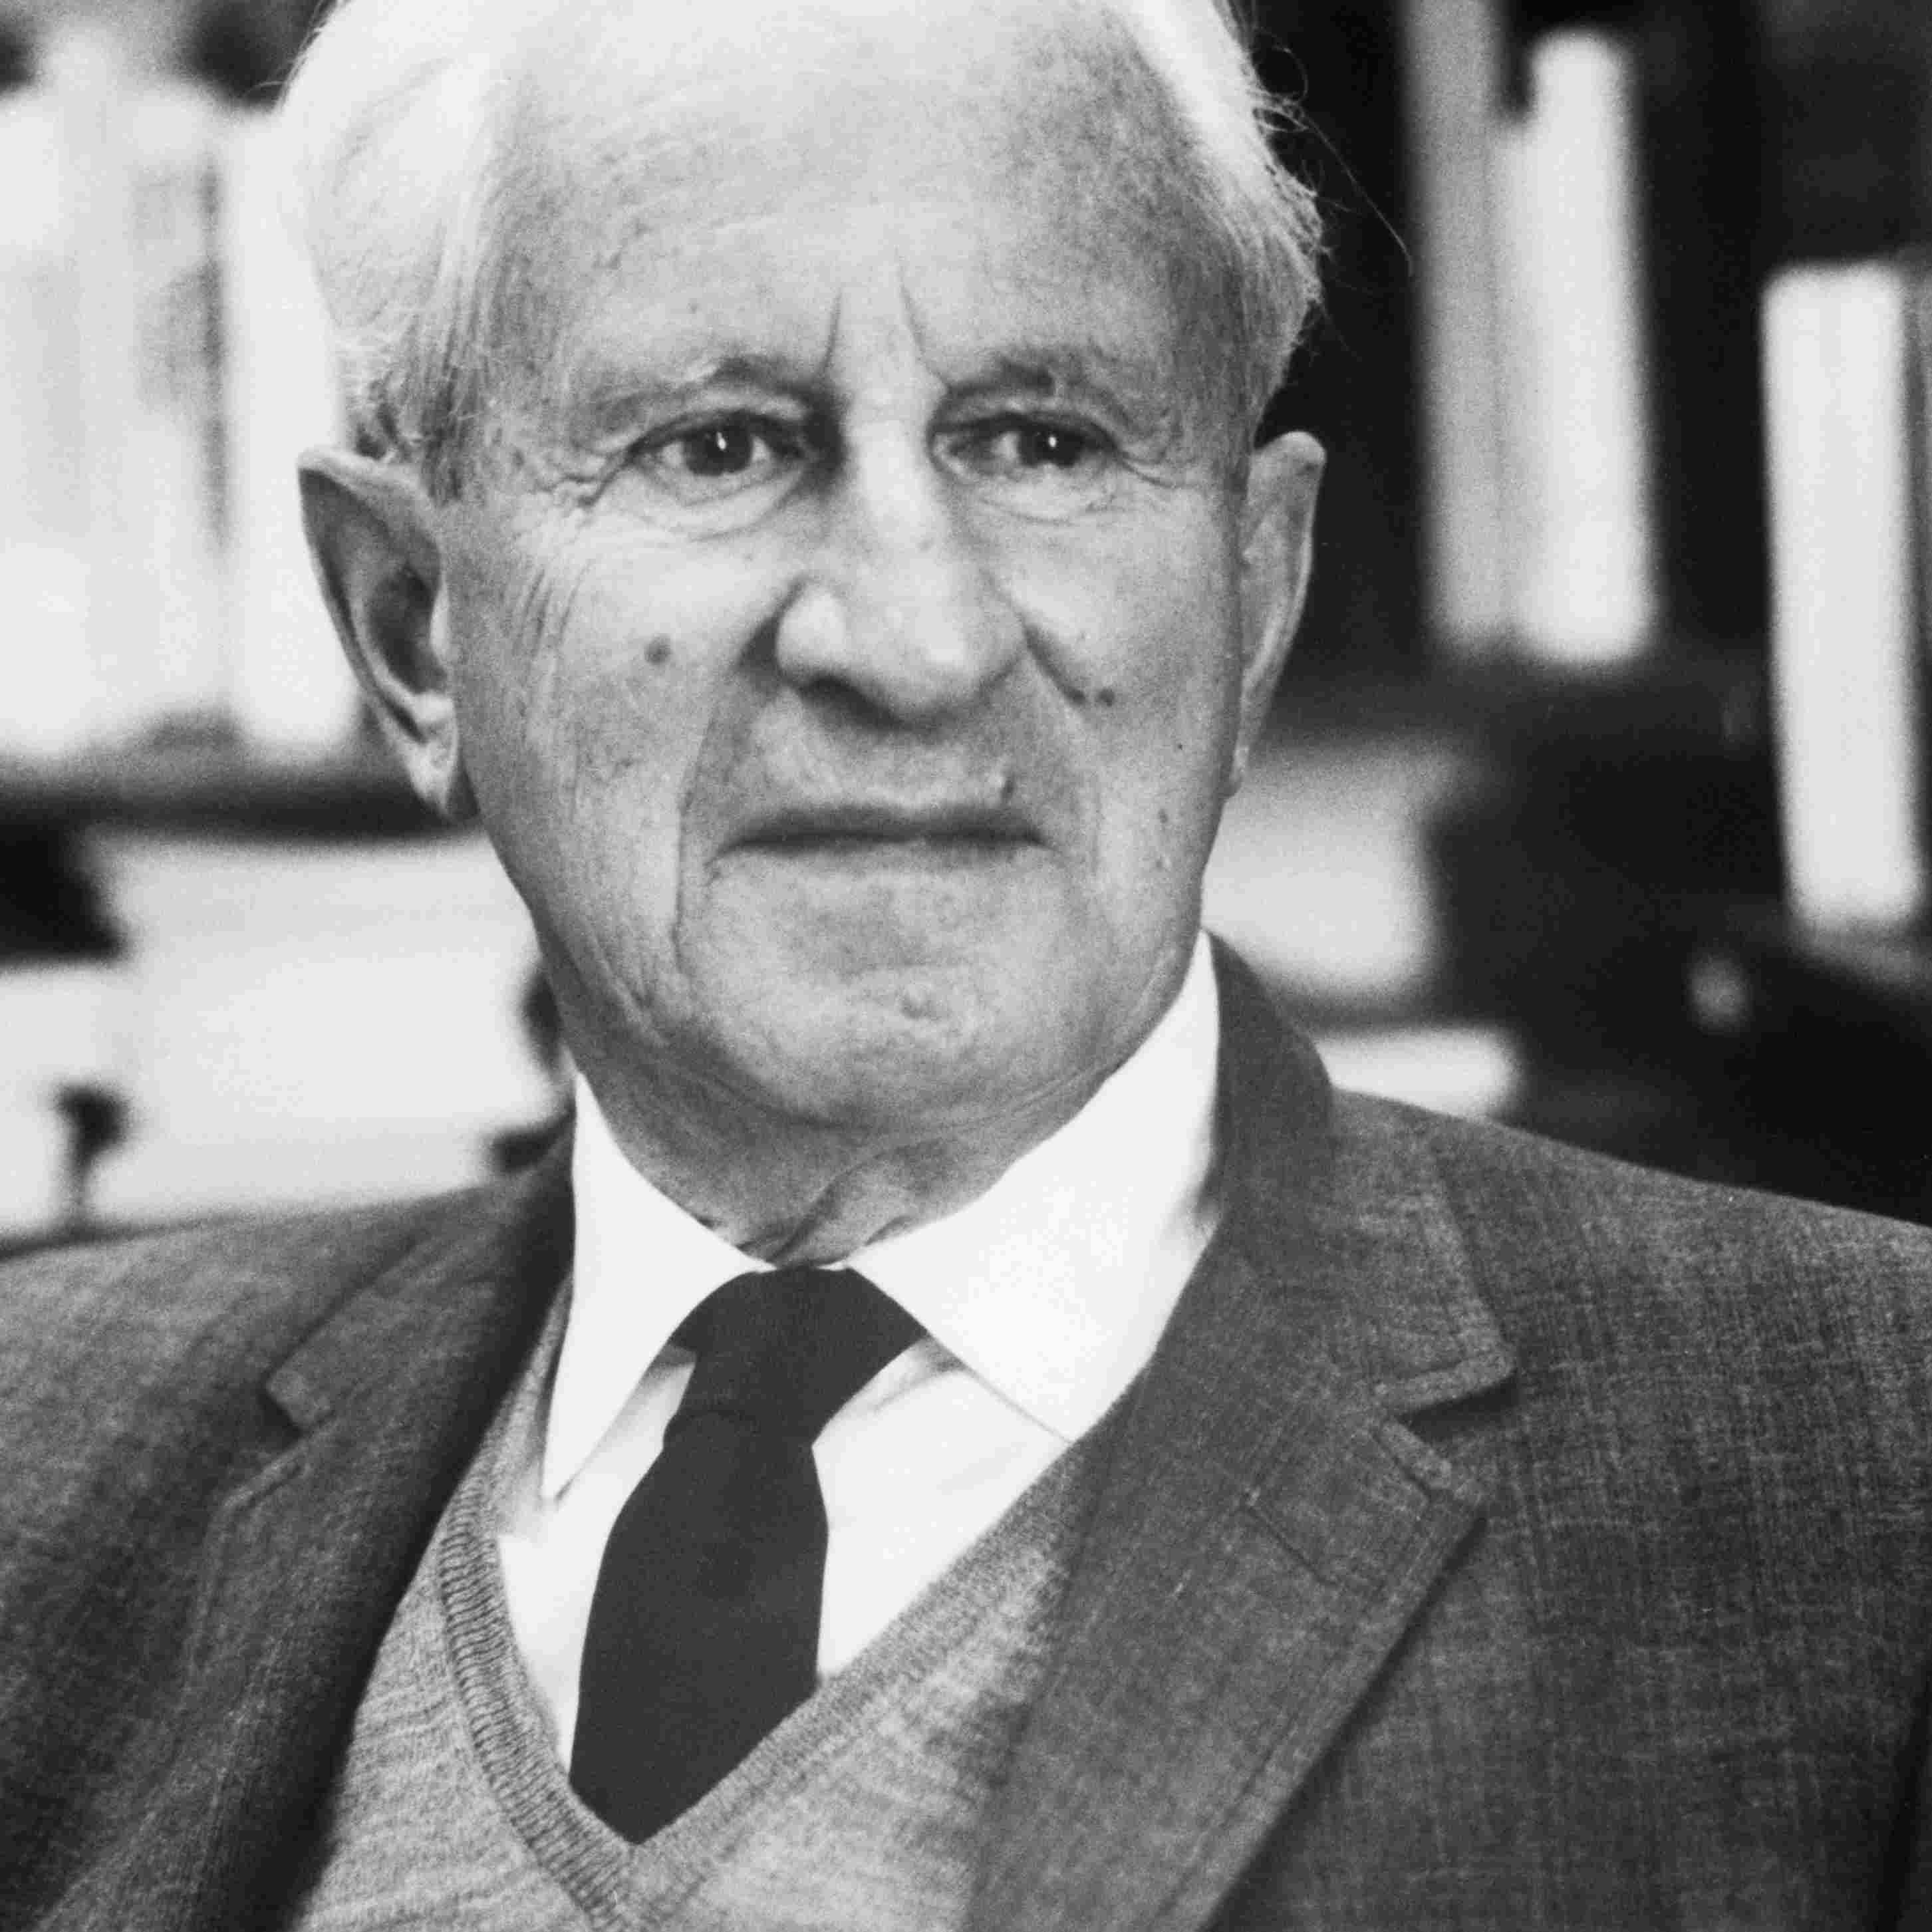 Philosopher Herbert Marcuse